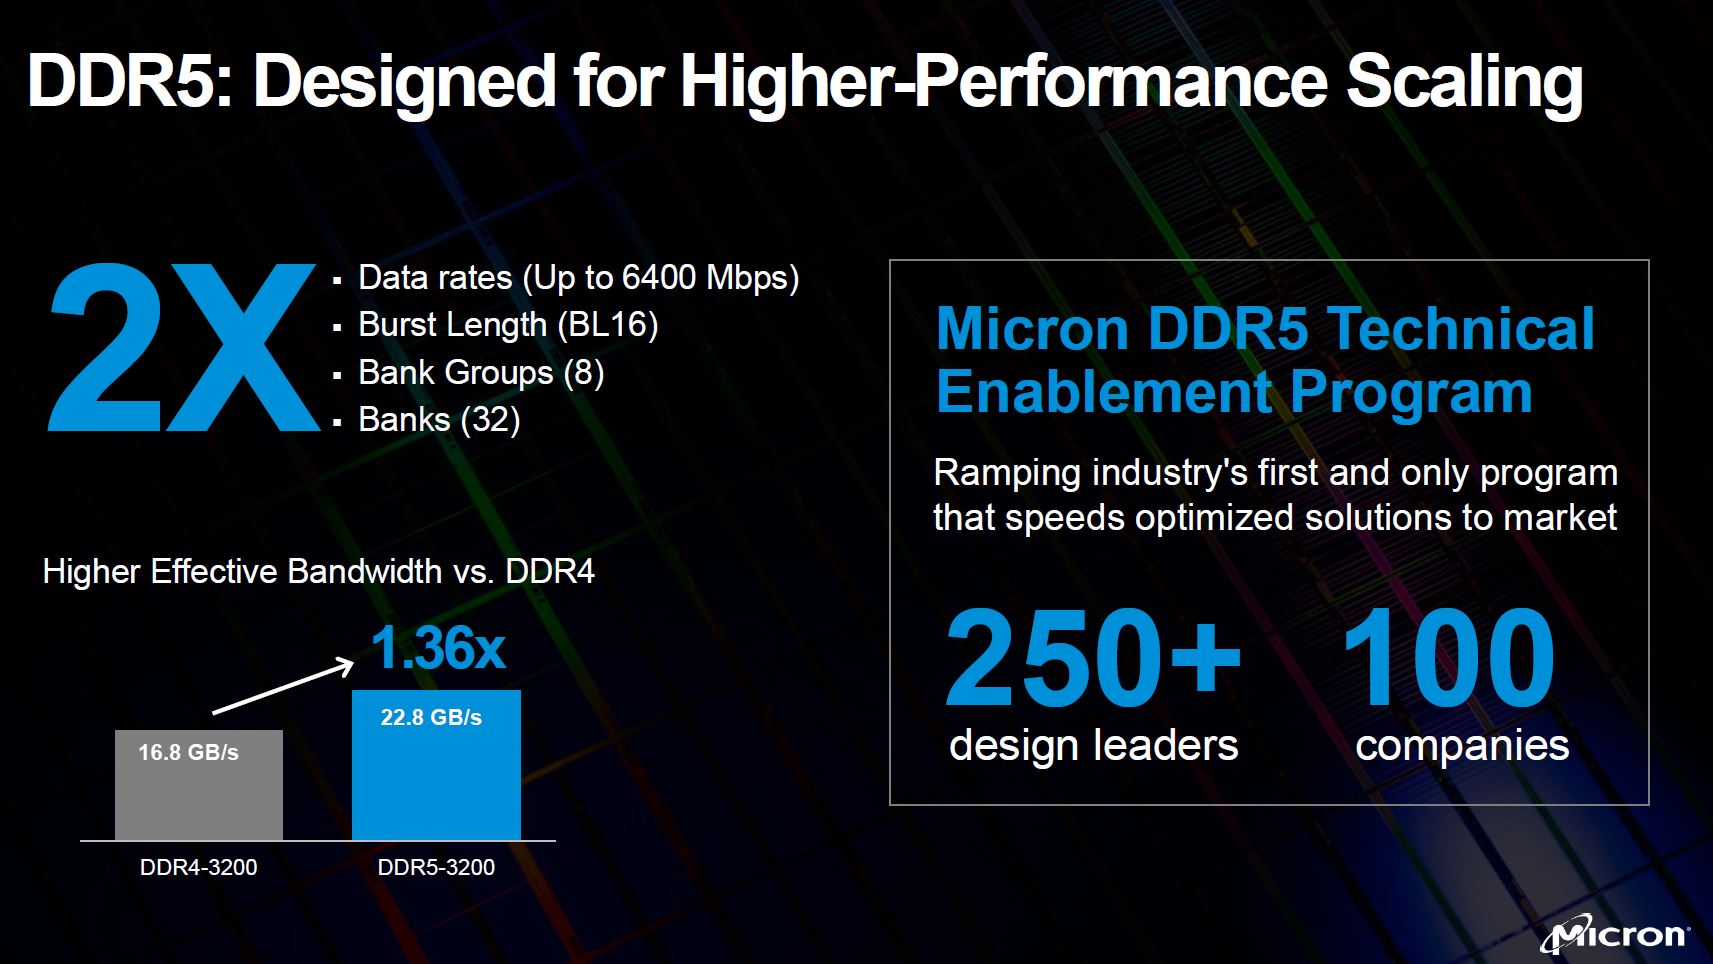 Micron Computex 2021 Keynote Memory Innovation DDR5